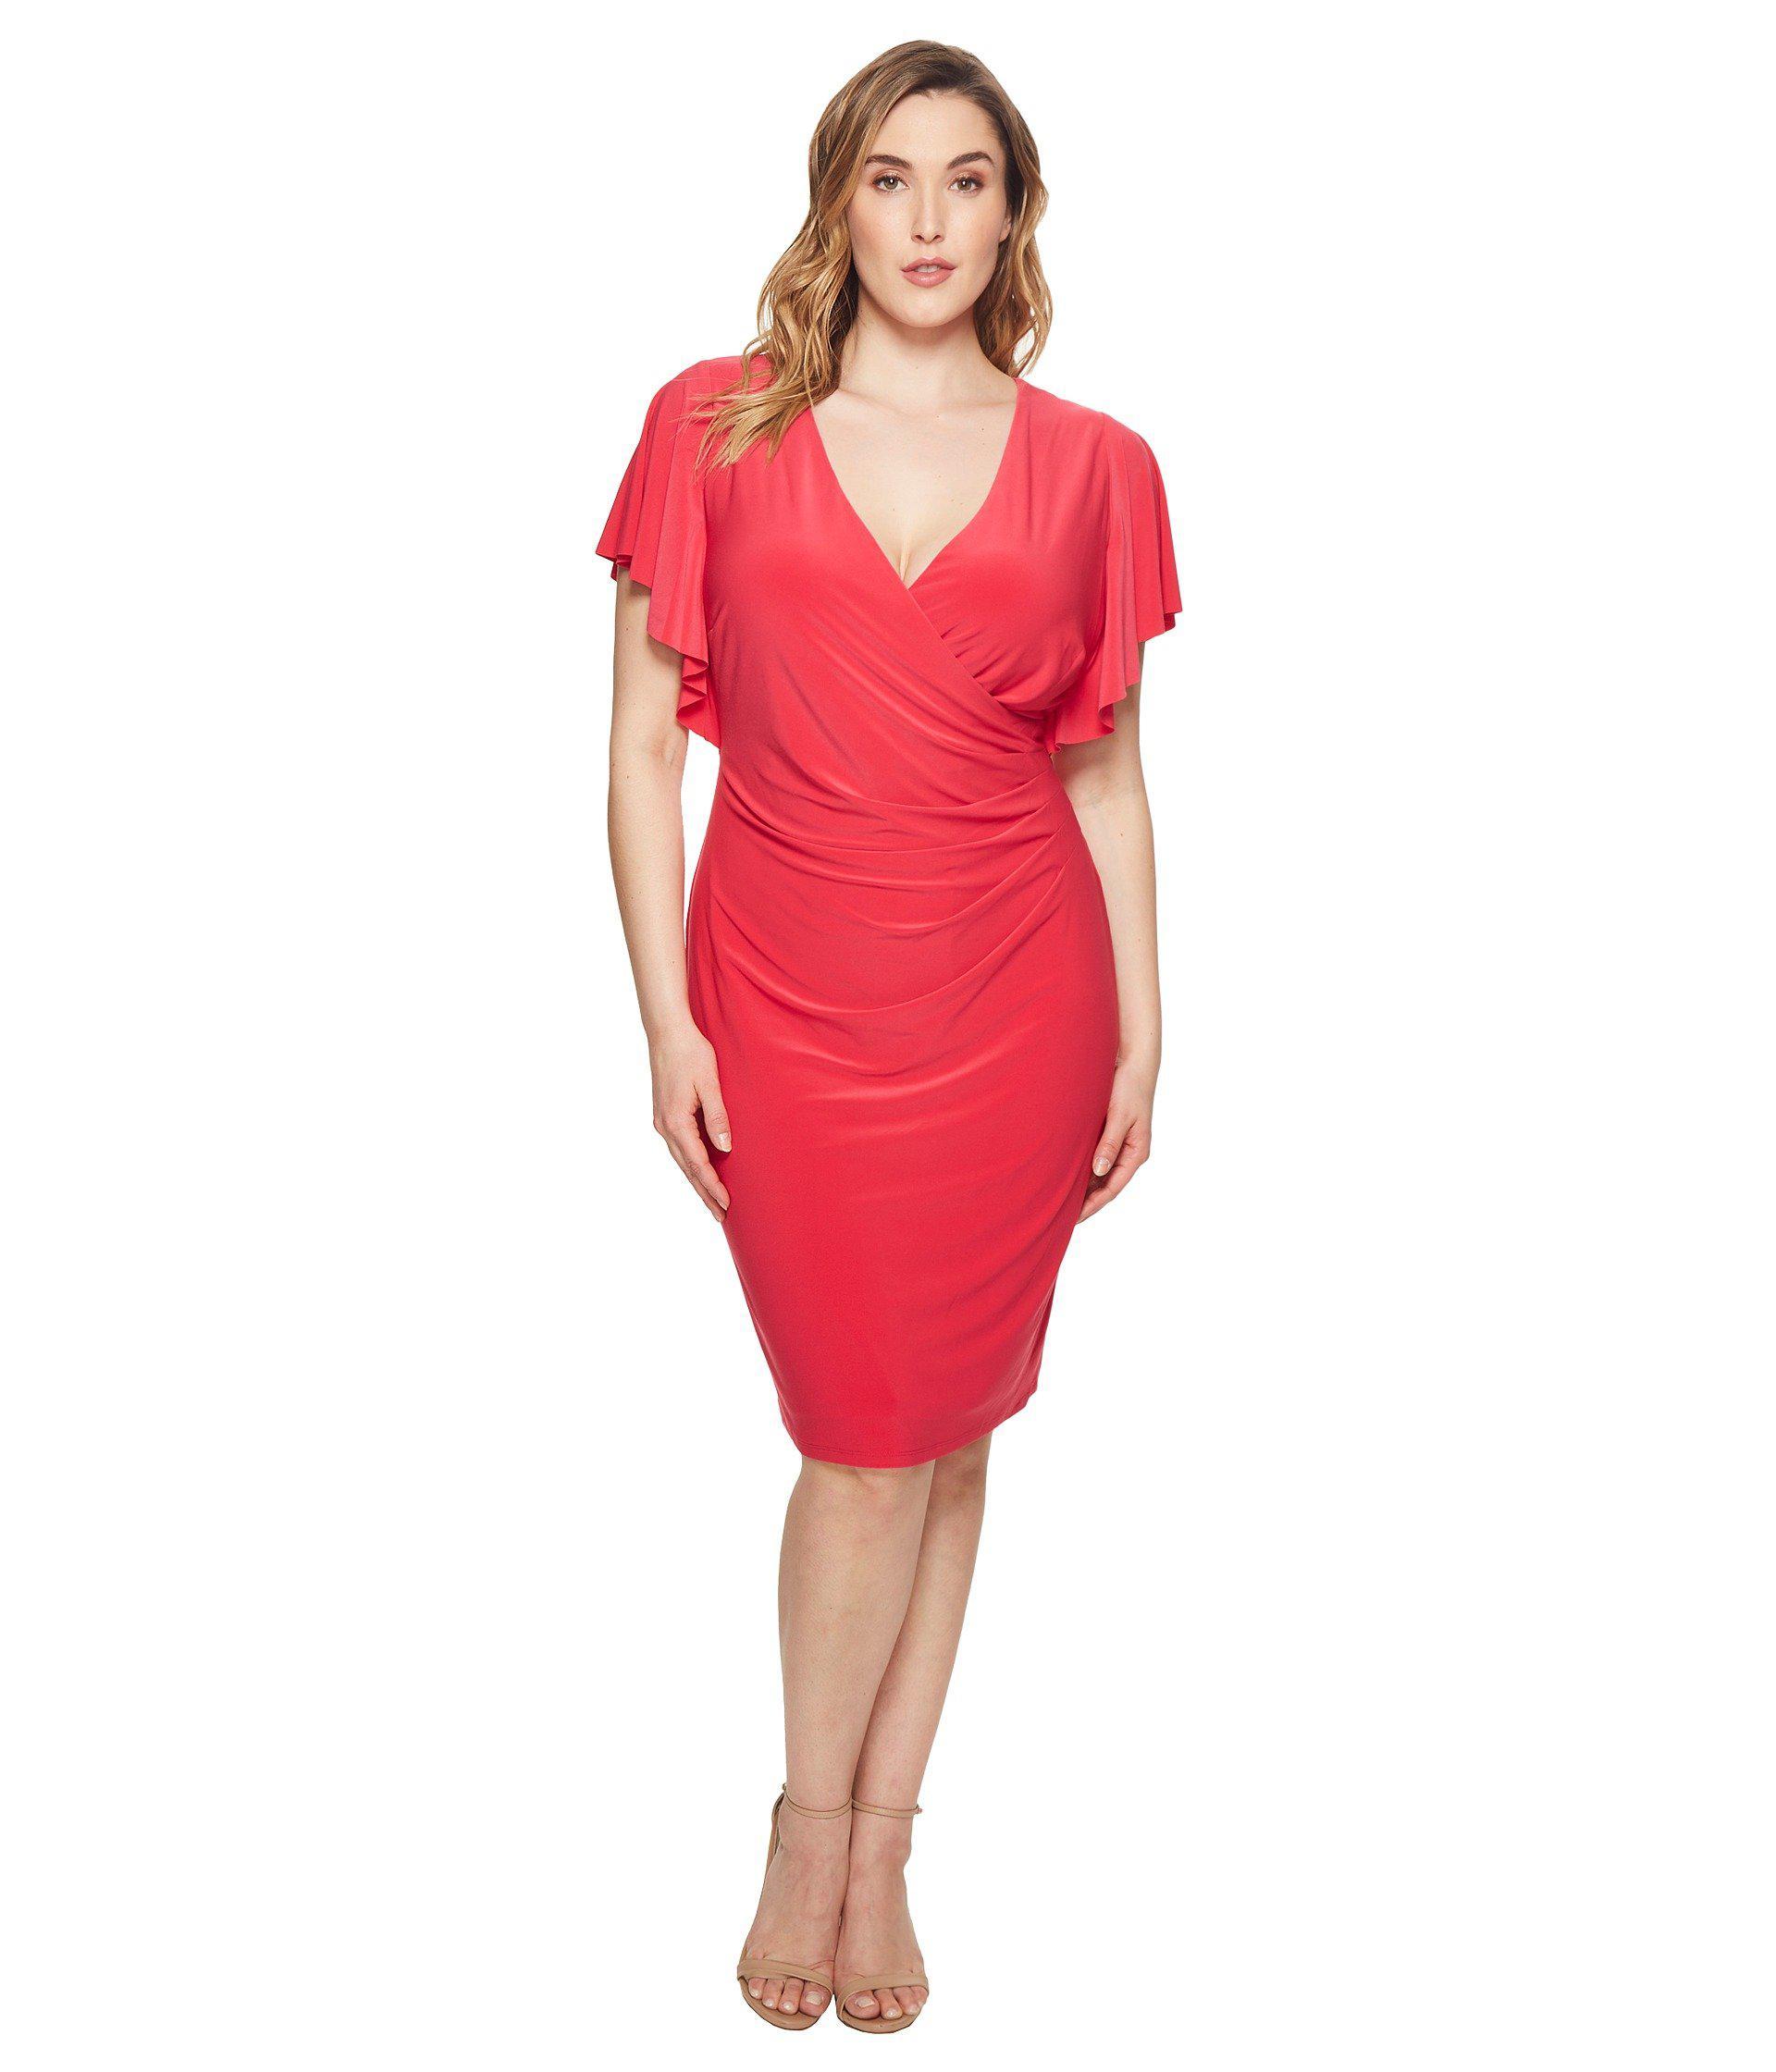 f7986631c1 Lauren by Ralph Lauren. Women s Red Plus Size Kahlo Matte Jersey Dress